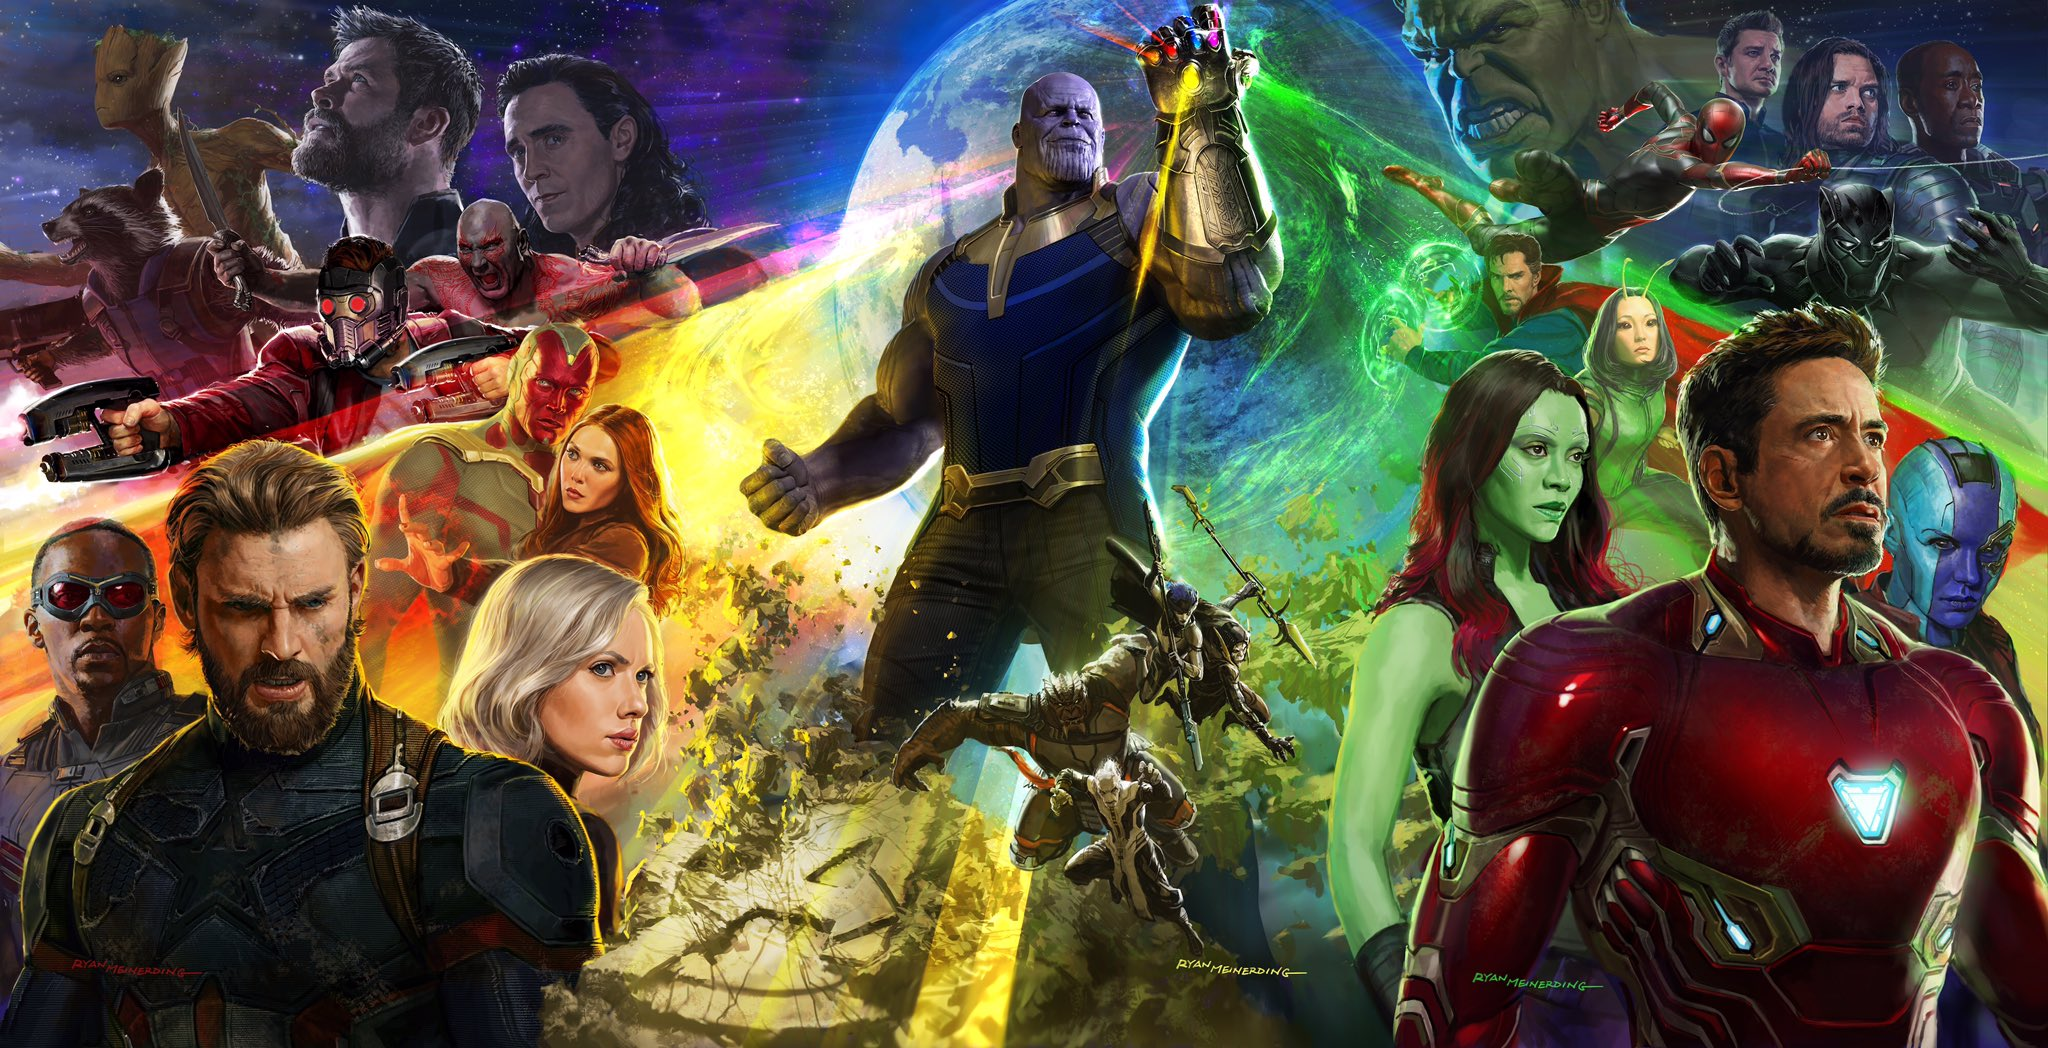 http://conceptartworld.com/wp-content/uploads/2017/07/Avengers-Infinity-War-SDCC-2017-Poster-Art.jpg